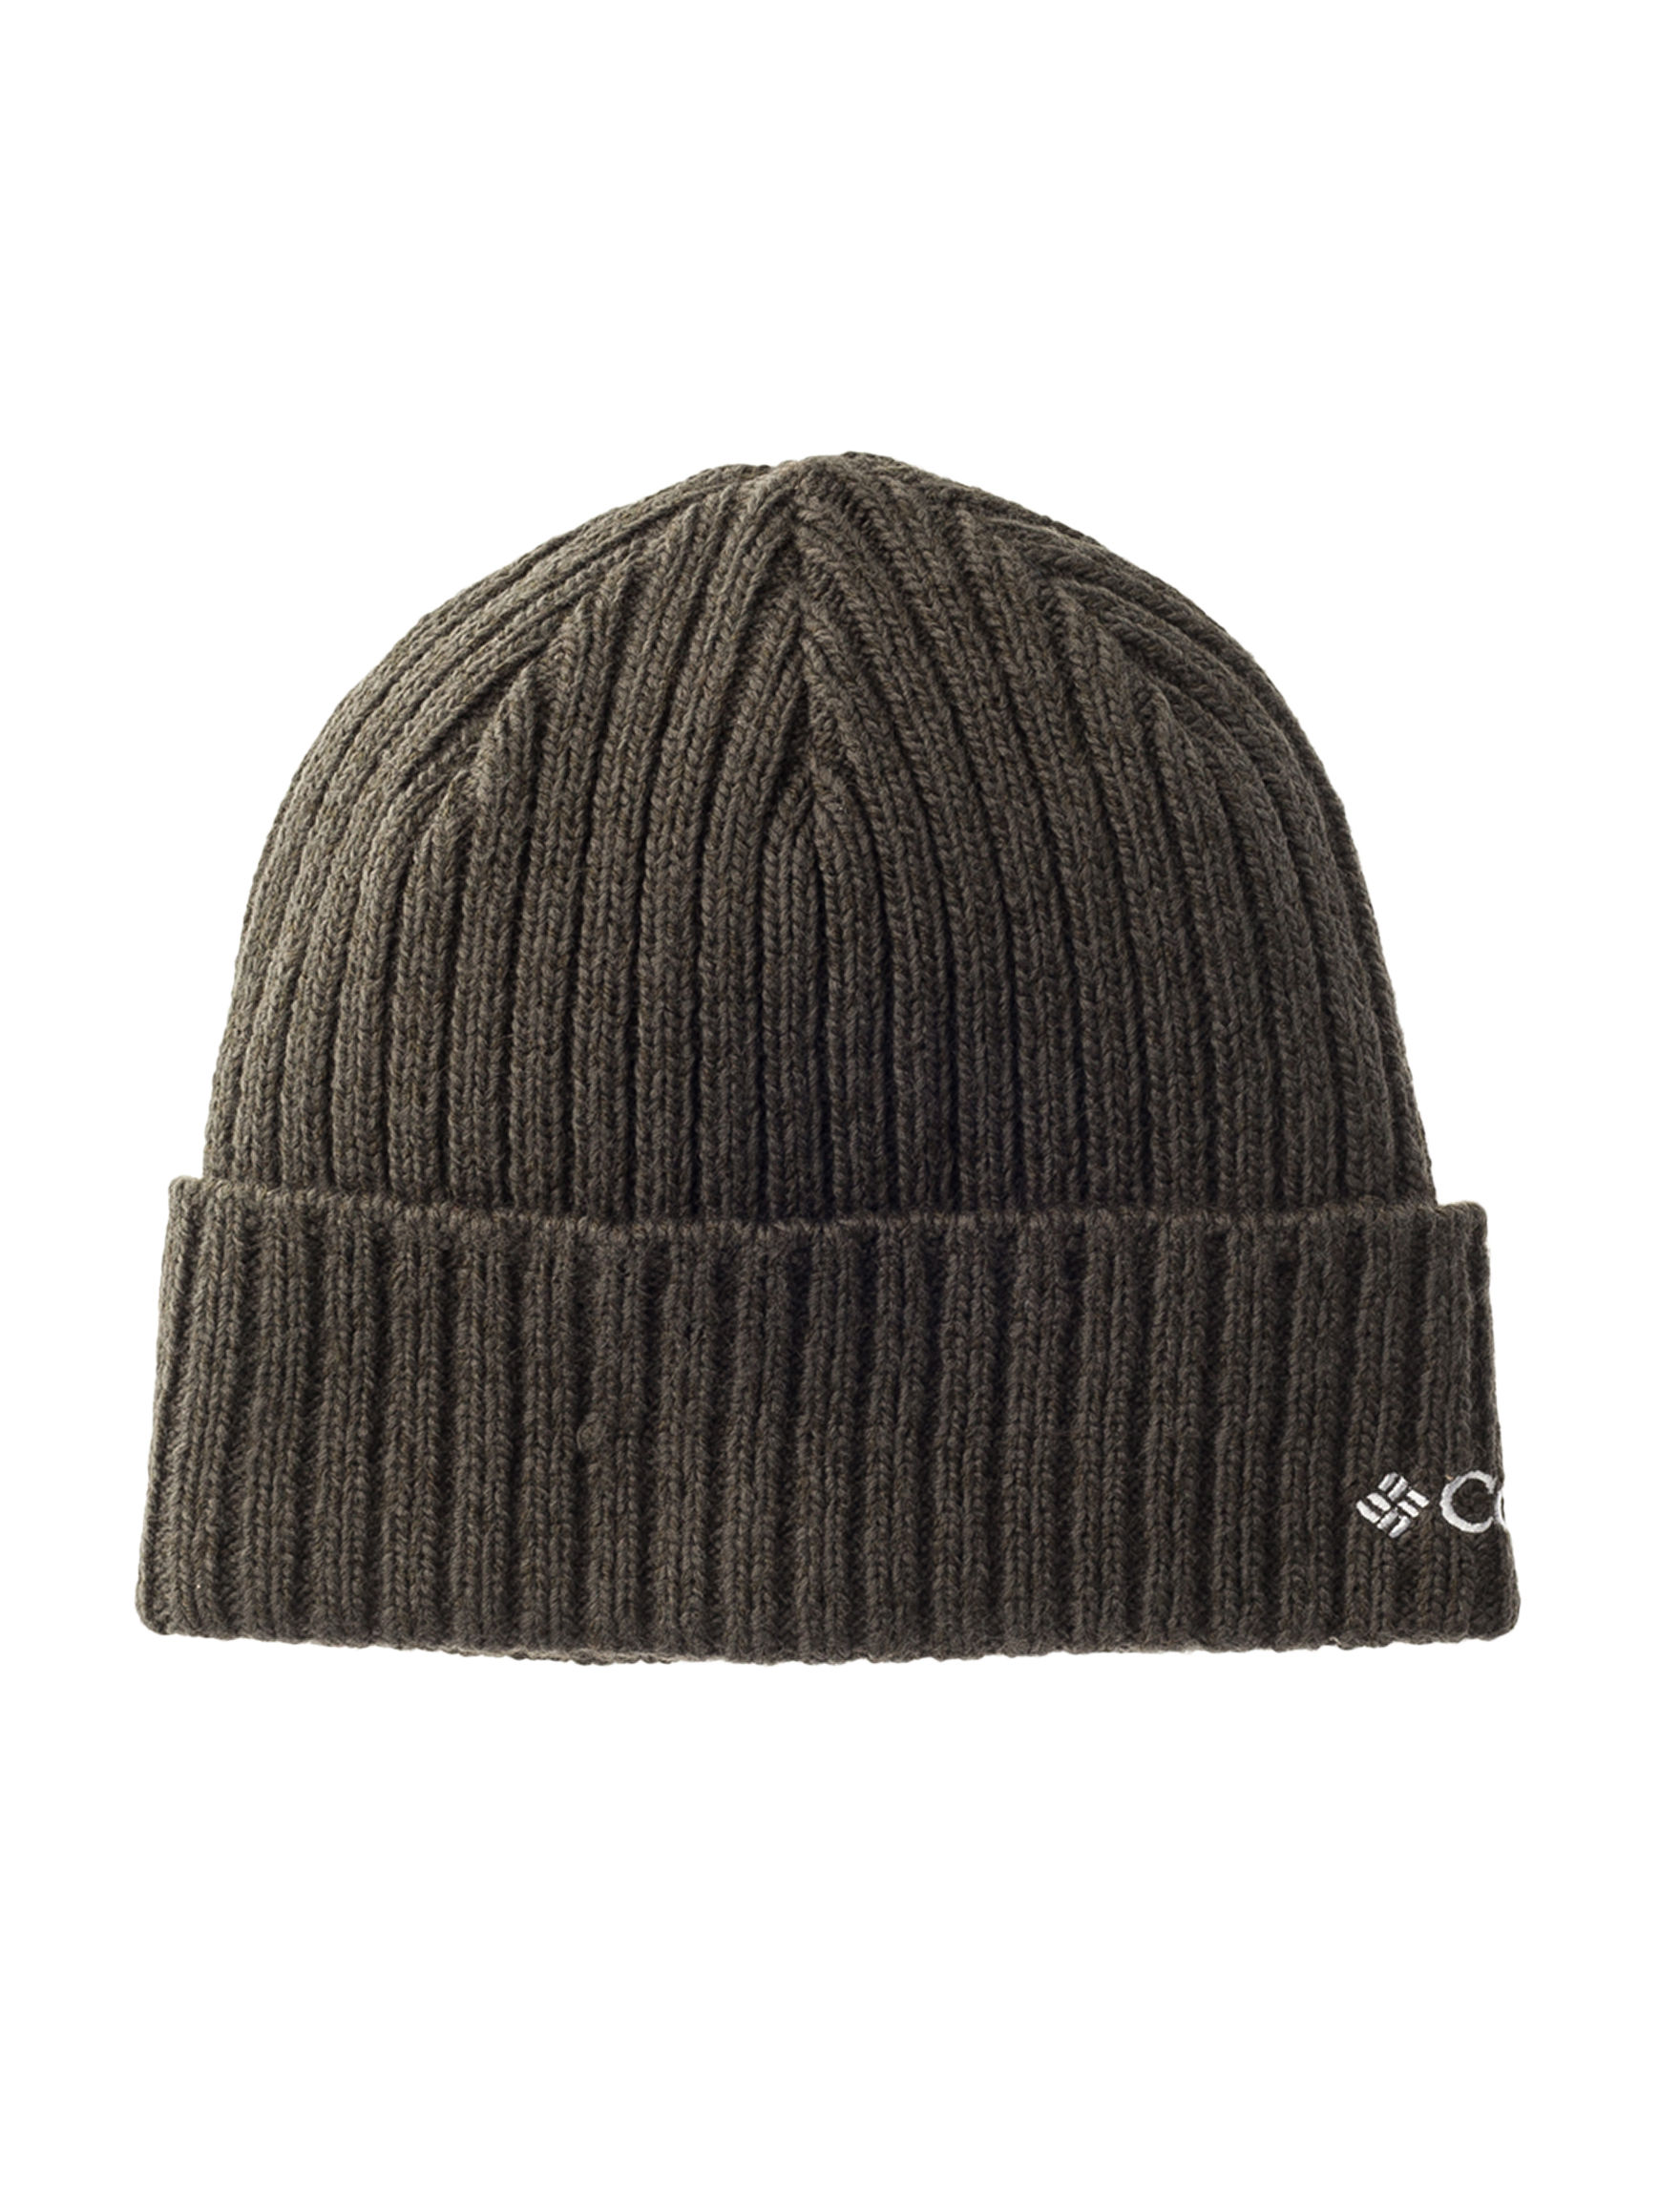 Columbia Gravel Hats & Headwear